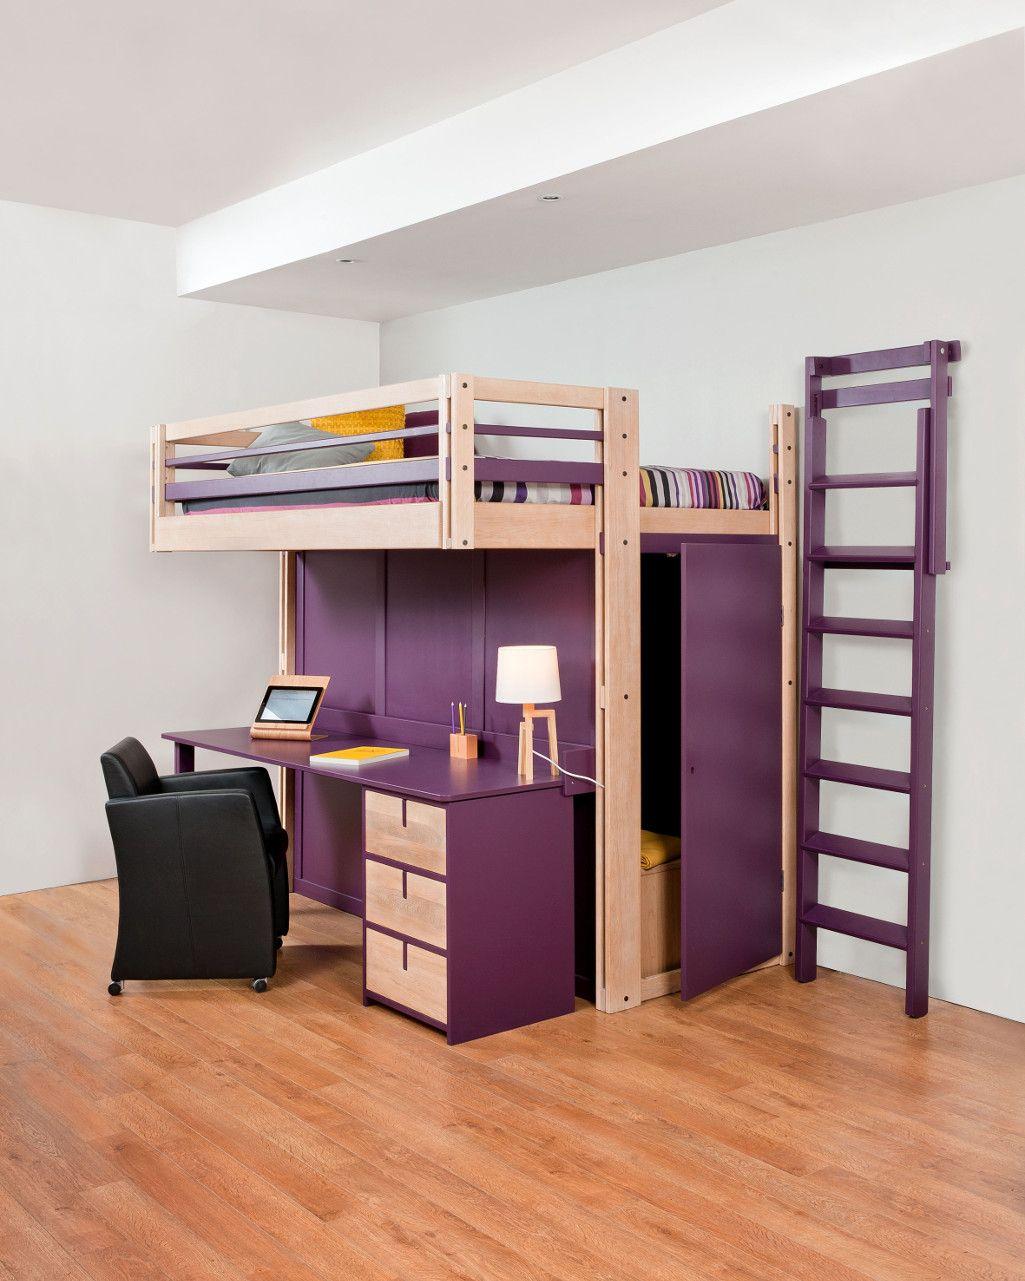 lit mezzanine rangement cgmrotterdam. Black Bedroom Furniture Sets. Home Design Ideas